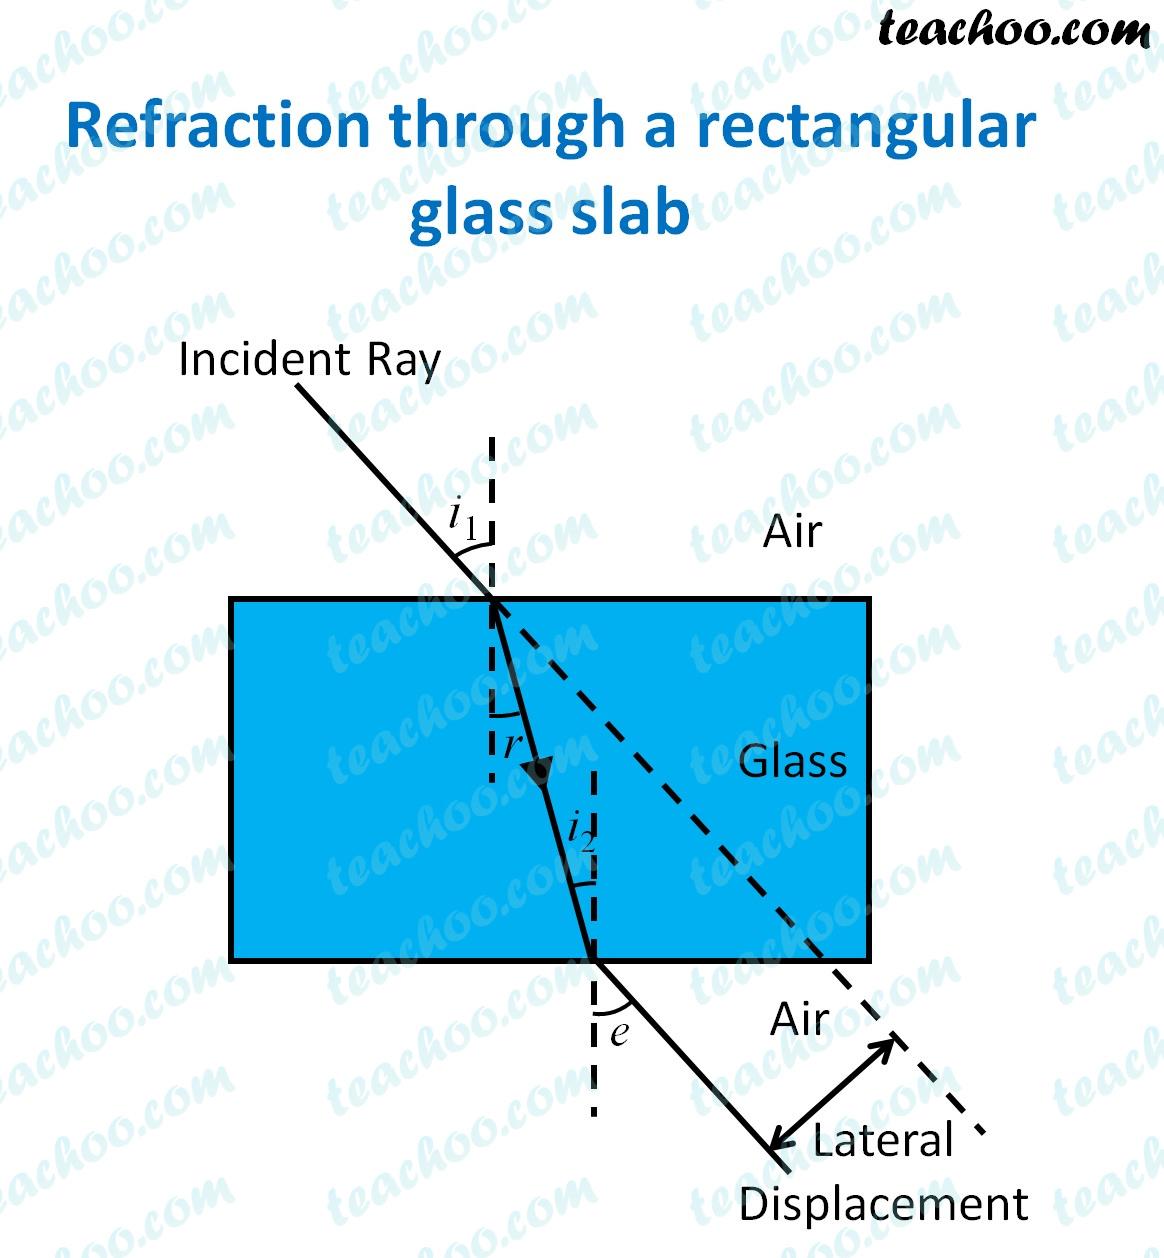 refraction-through-a-rectangular-glass-slab---teachoo.jpg